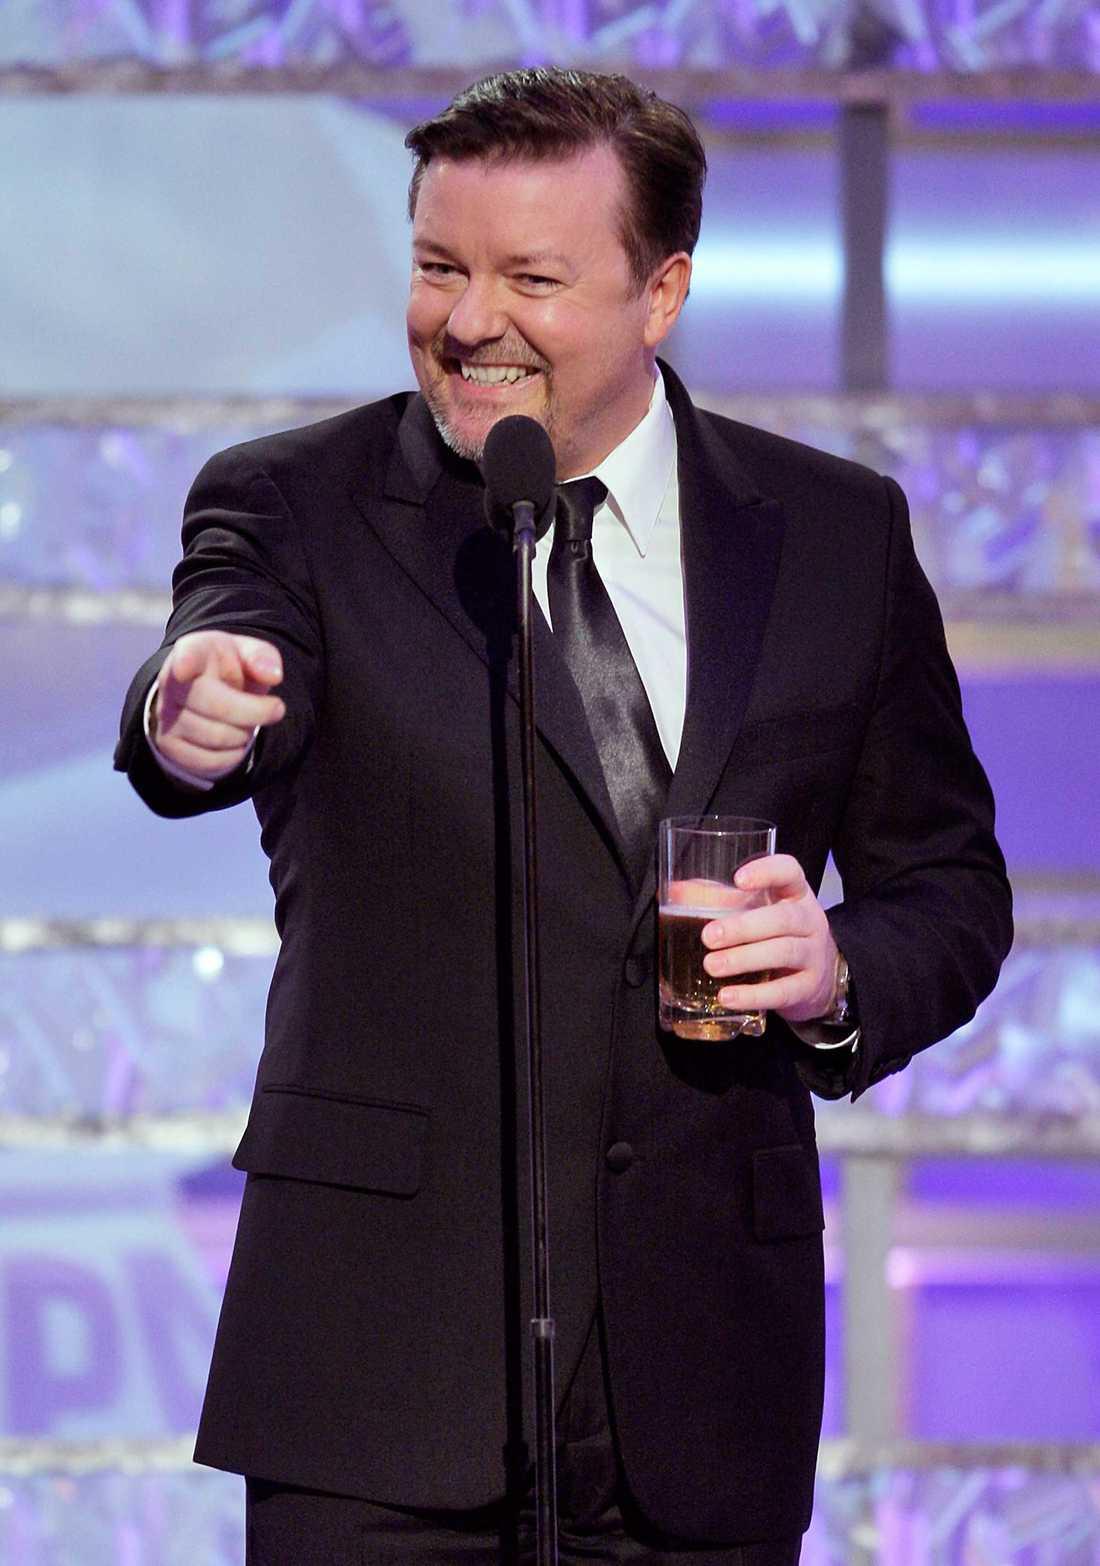 Ricky Gervais på Golden Globe 2009. Komikern leder galan även denna gång.